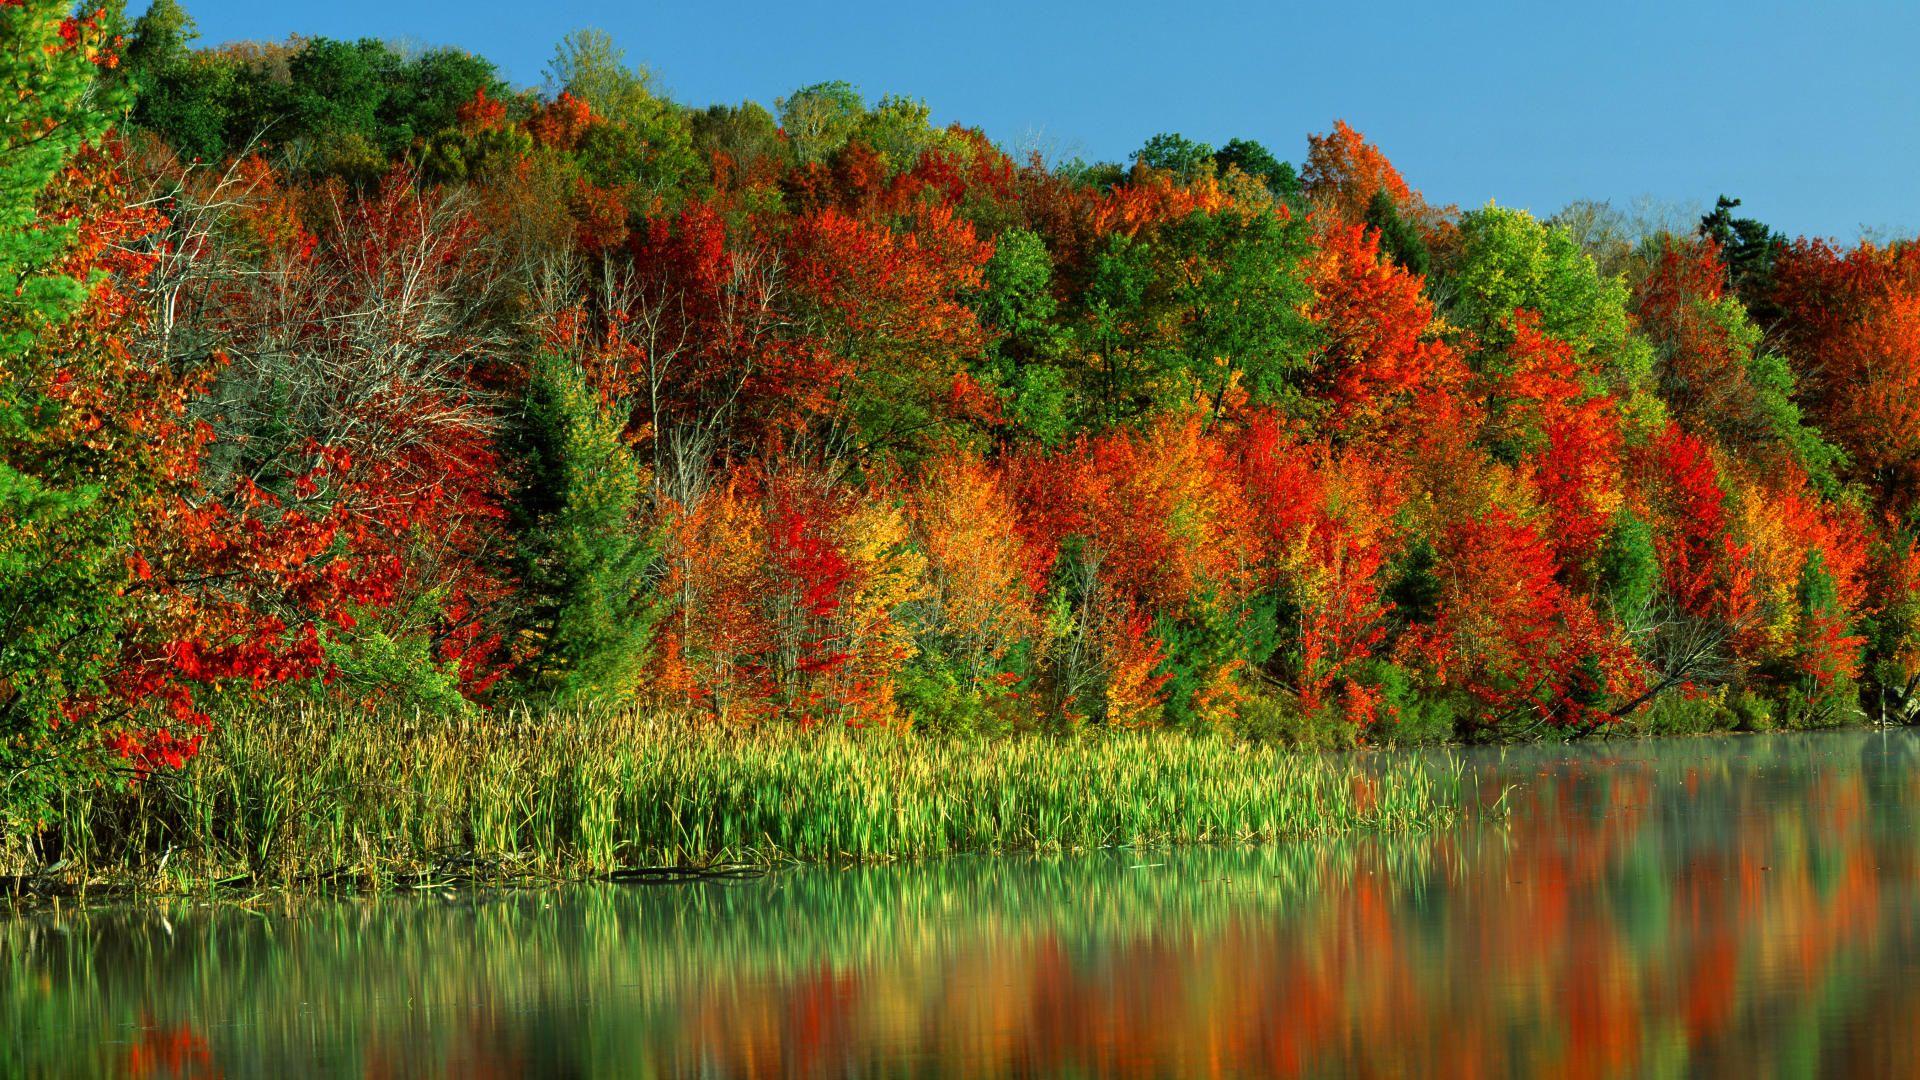 Morning Light, Horseshoe Lake, Adirondack Park and Preserve, New York - http://imashon.com/travel/morning-light-horseshoe-lake-adirondack-park-and-preserve-new-york.html